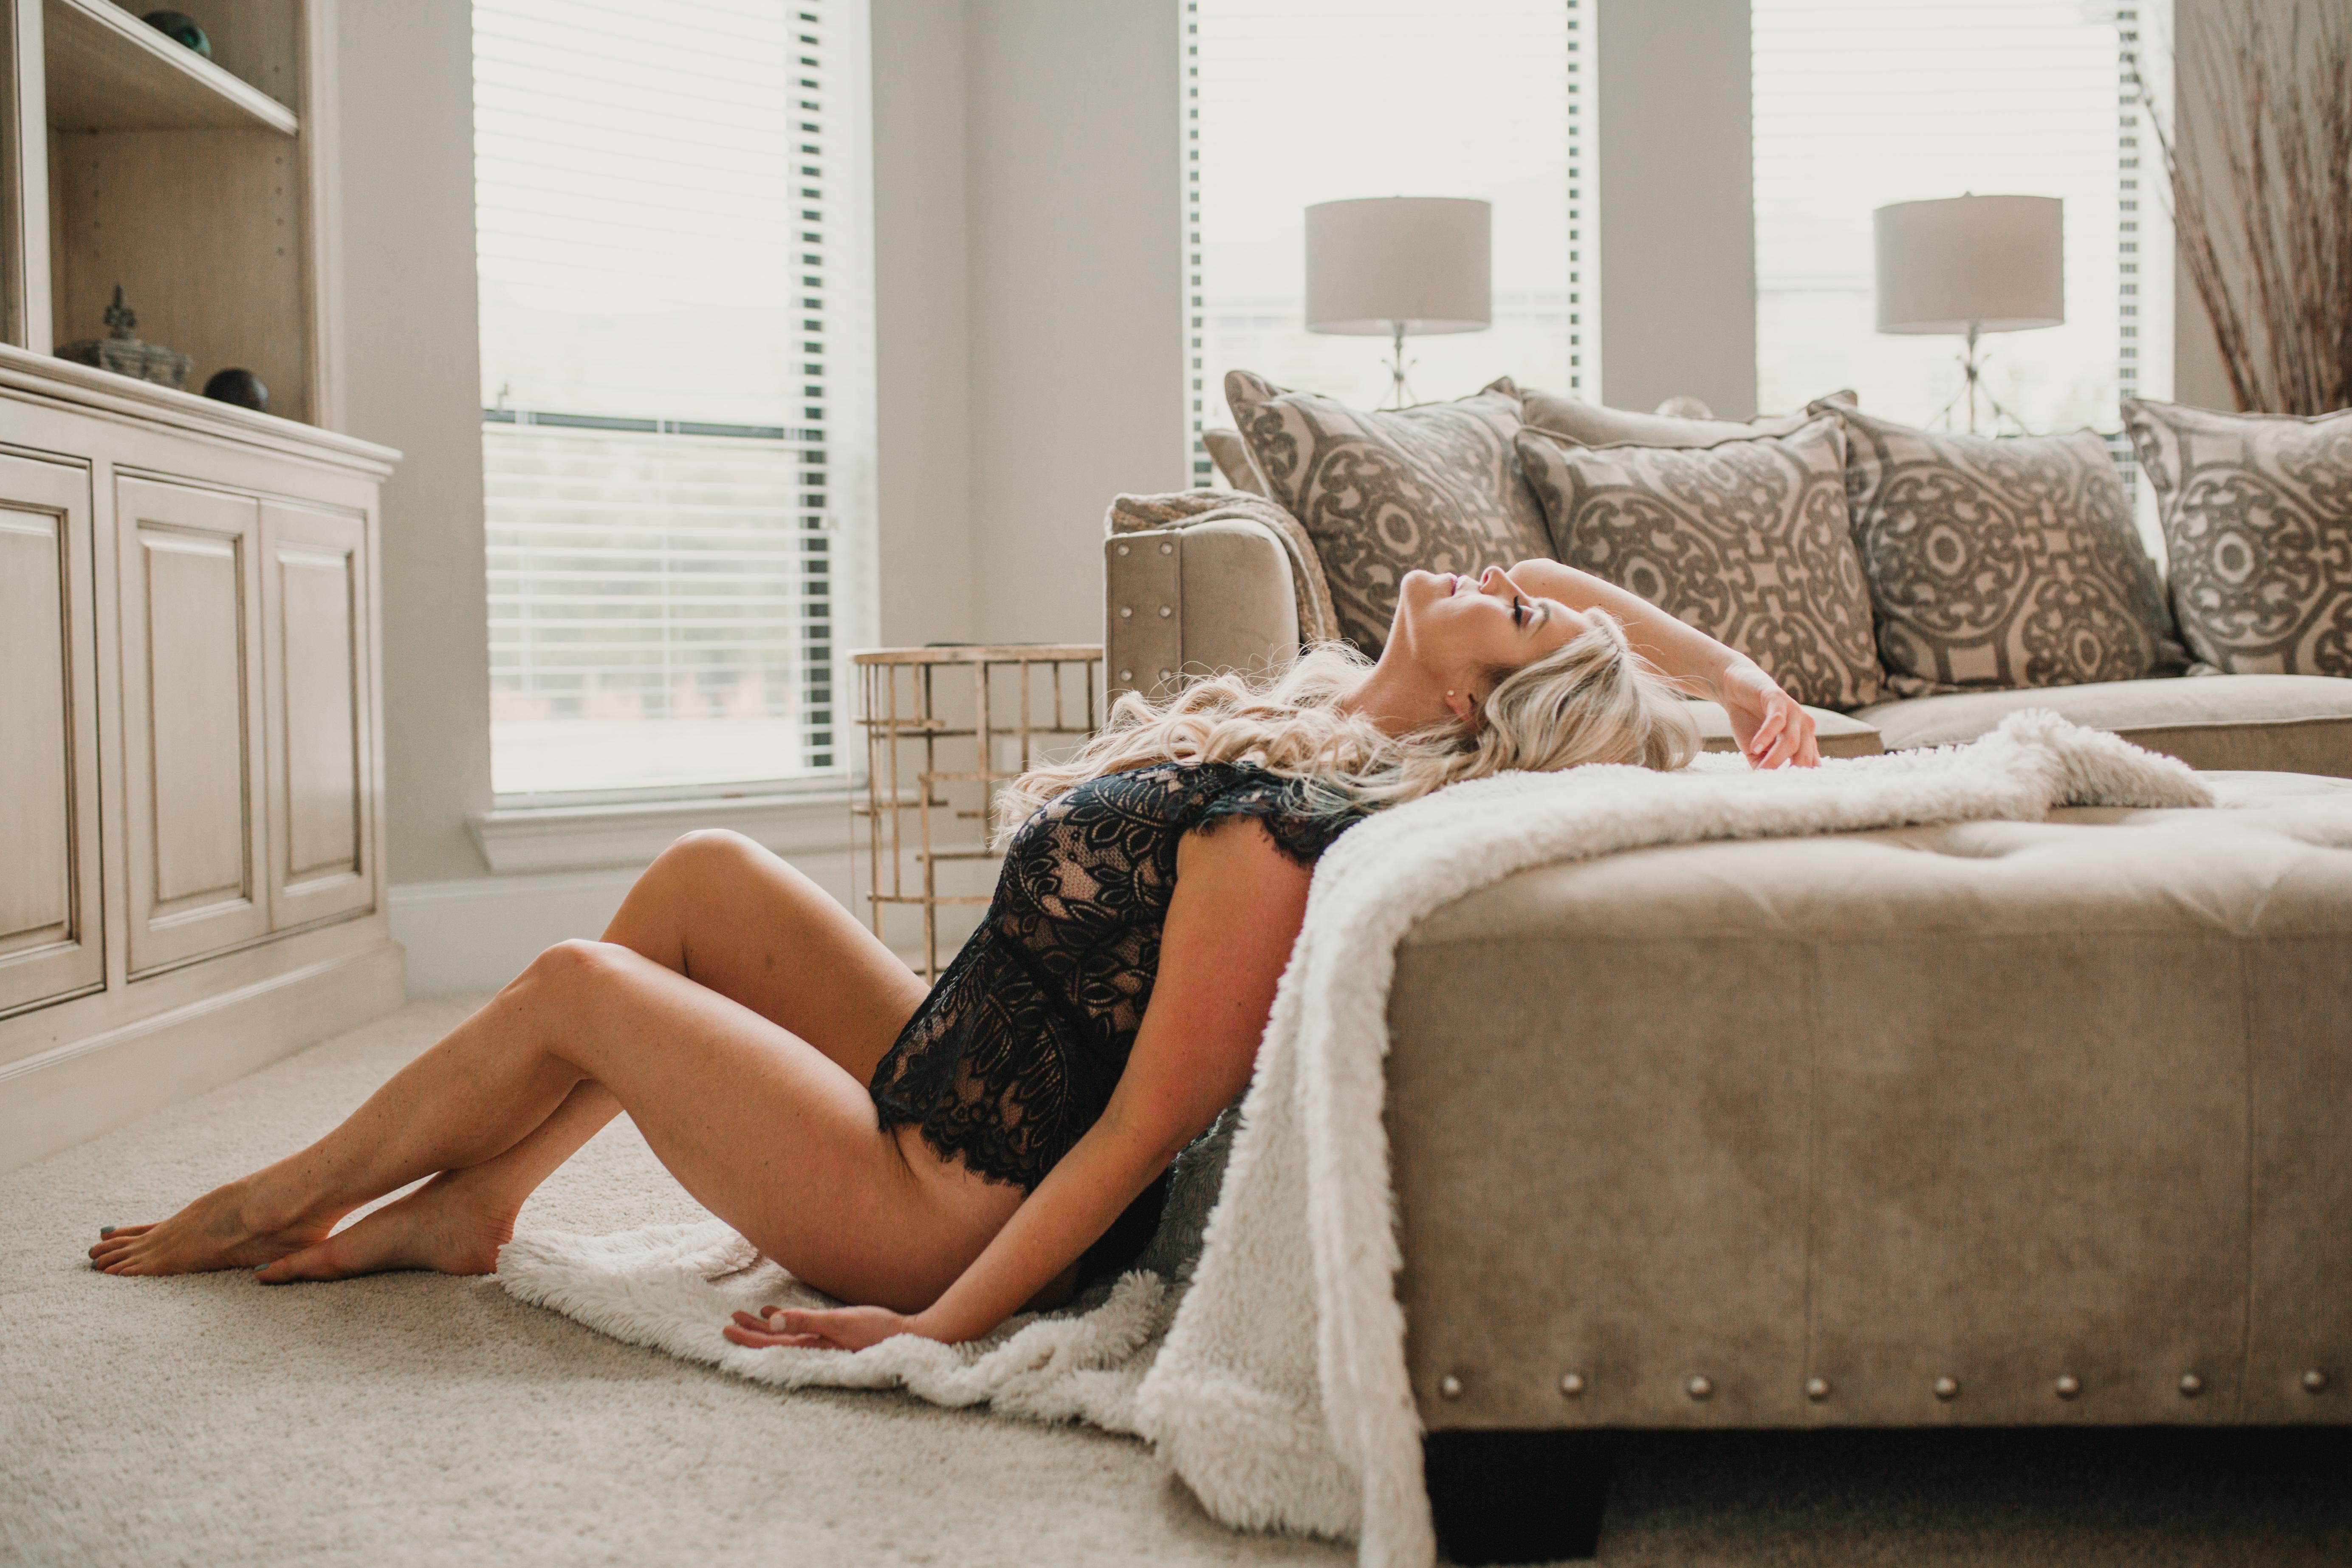 Best Calgary Boudoir Photographer Empowerment Self Love Intimate Portraits